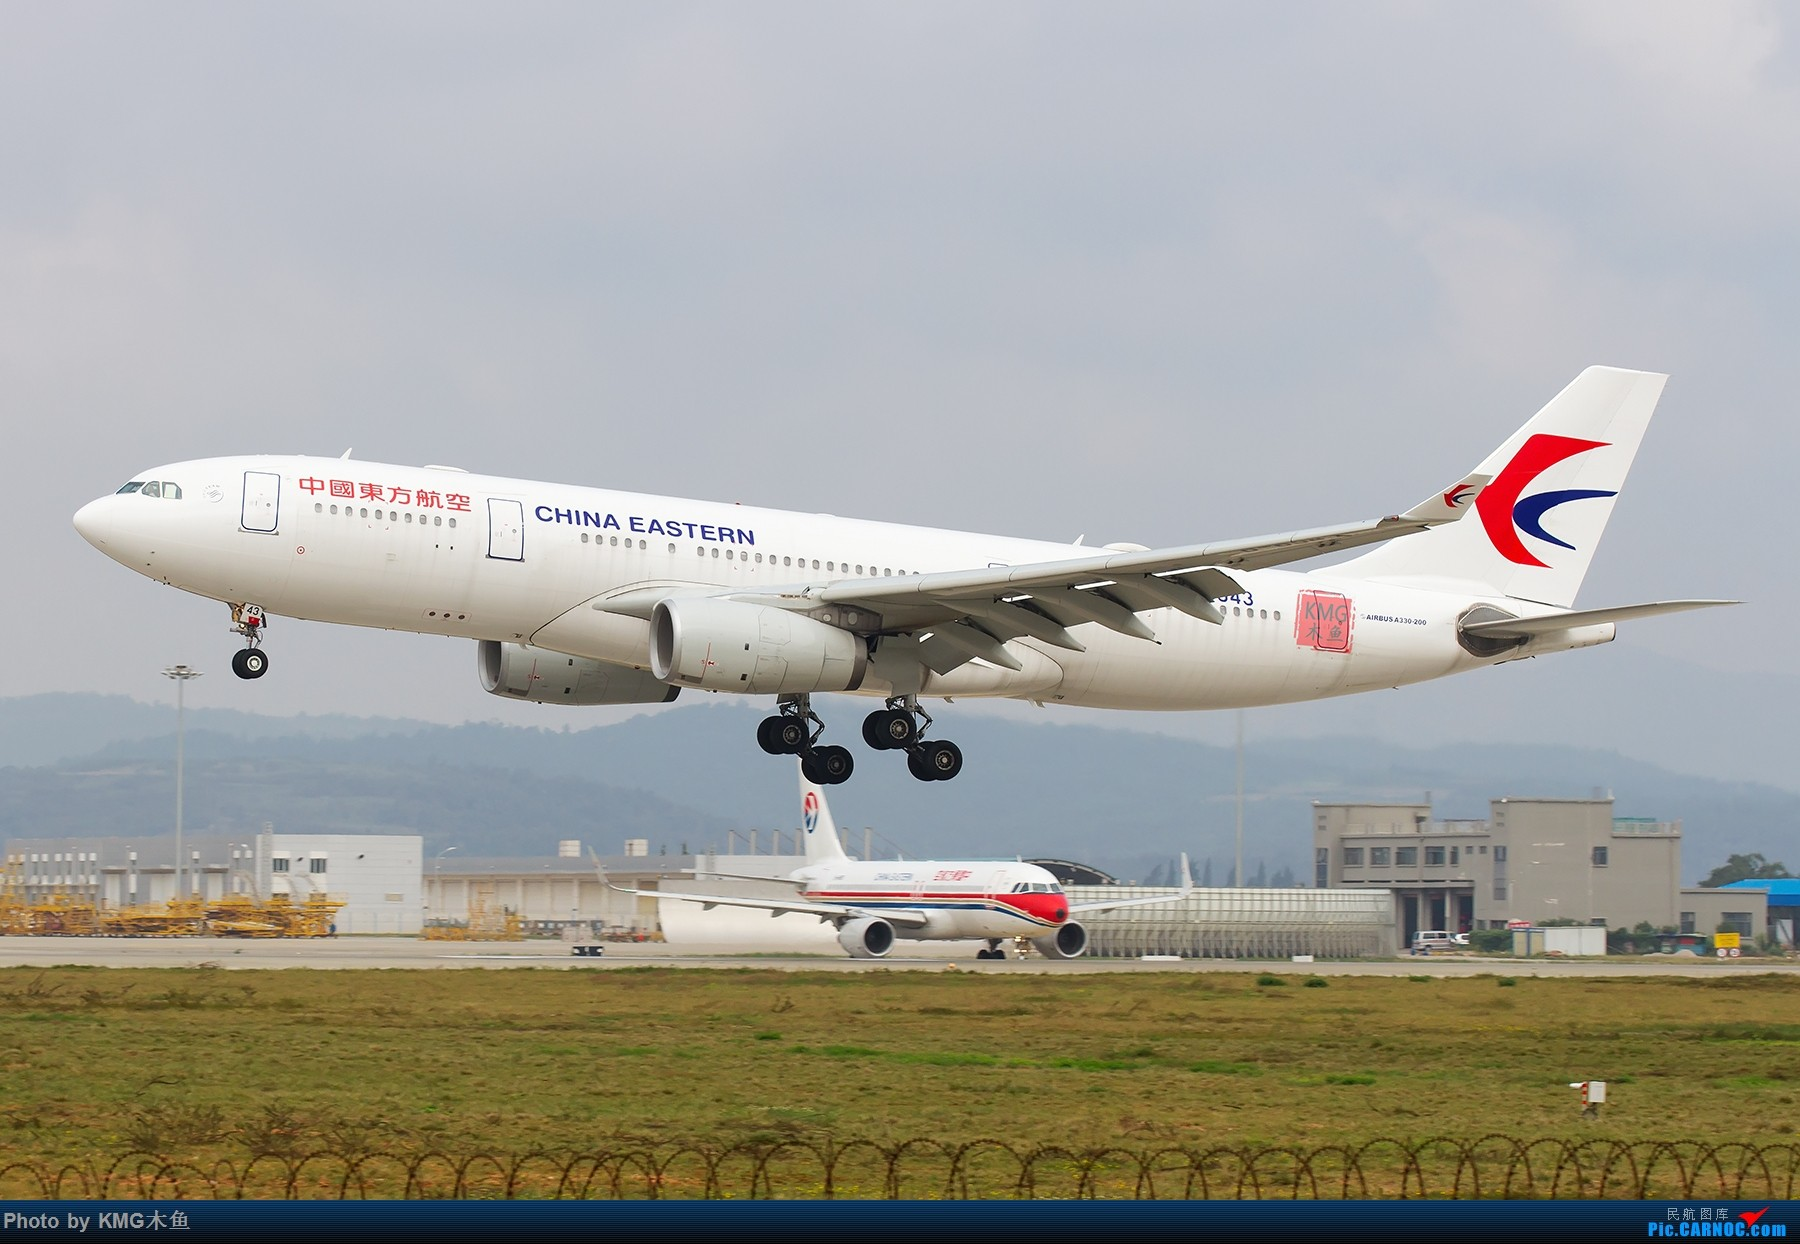 Re:[原创]【昆明长水国际机场—KMG木鱼10.16日拍机】周末拍机,有宽体,有彩绘,少了小伙伴们,独自一人拍机 AIRBUS A330-200 B-6543 中国昆明长水国际机场